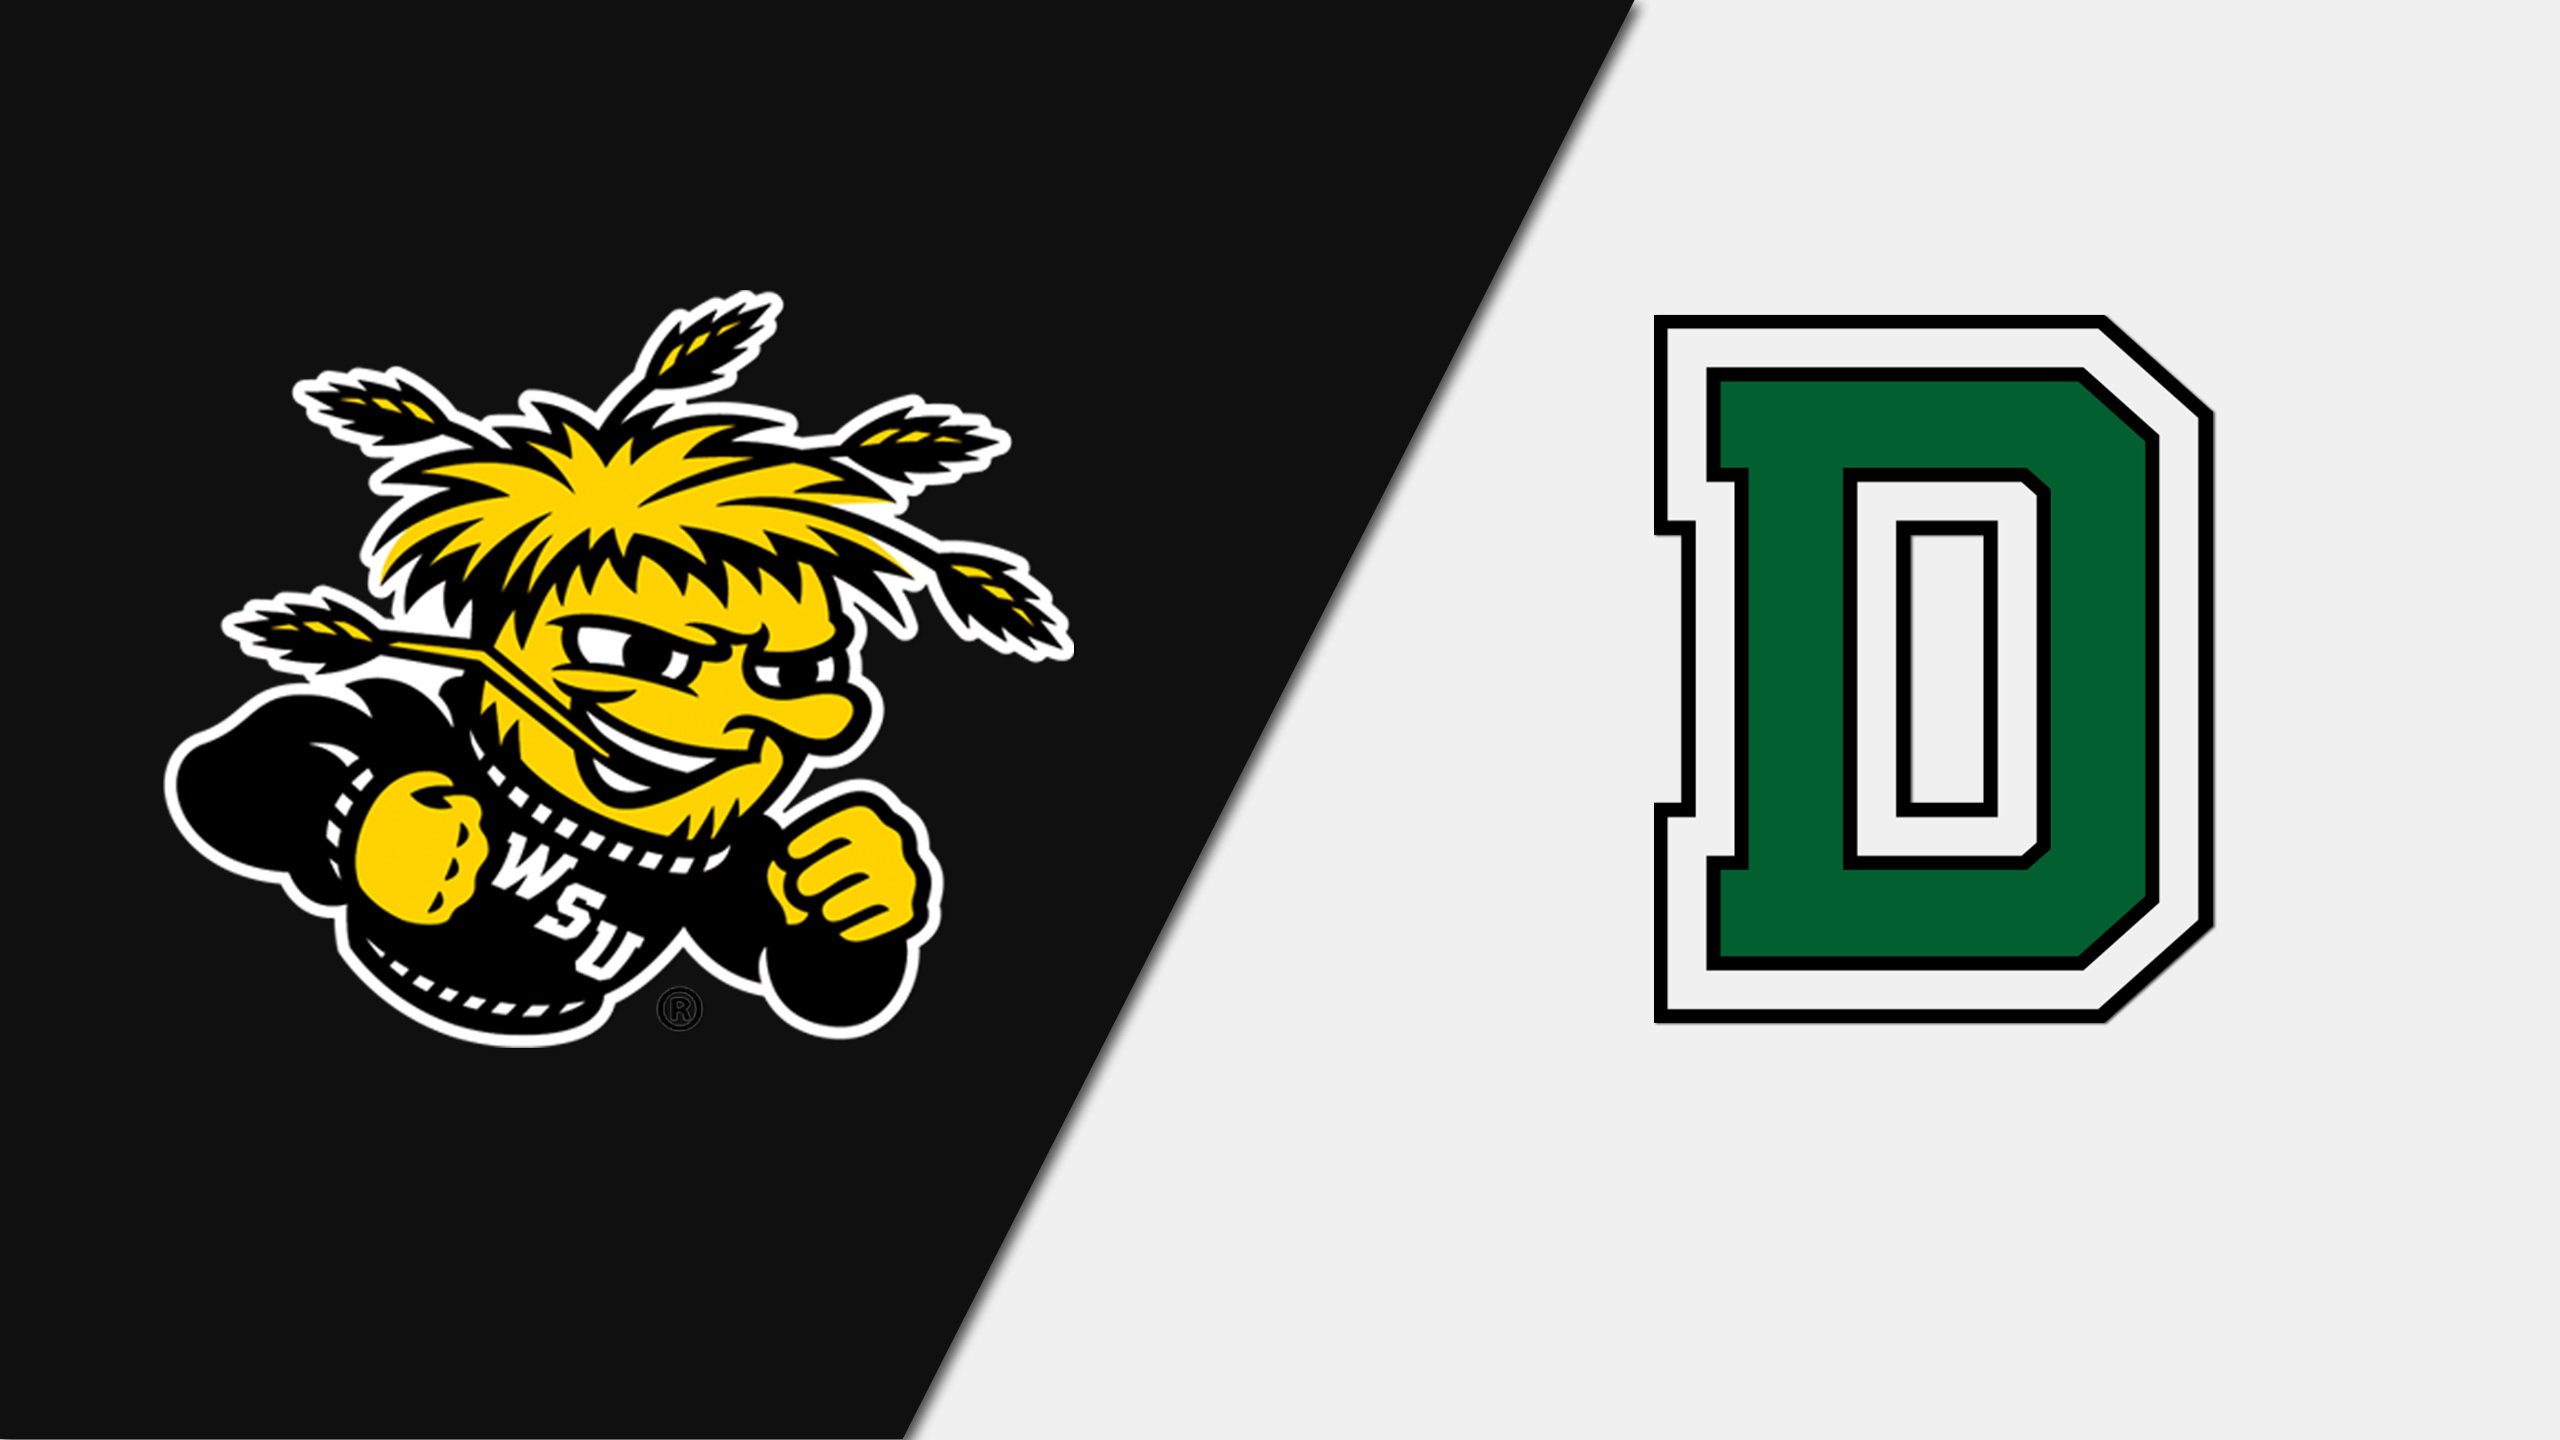 Wichita State vs. Dartmouth (Court 1)